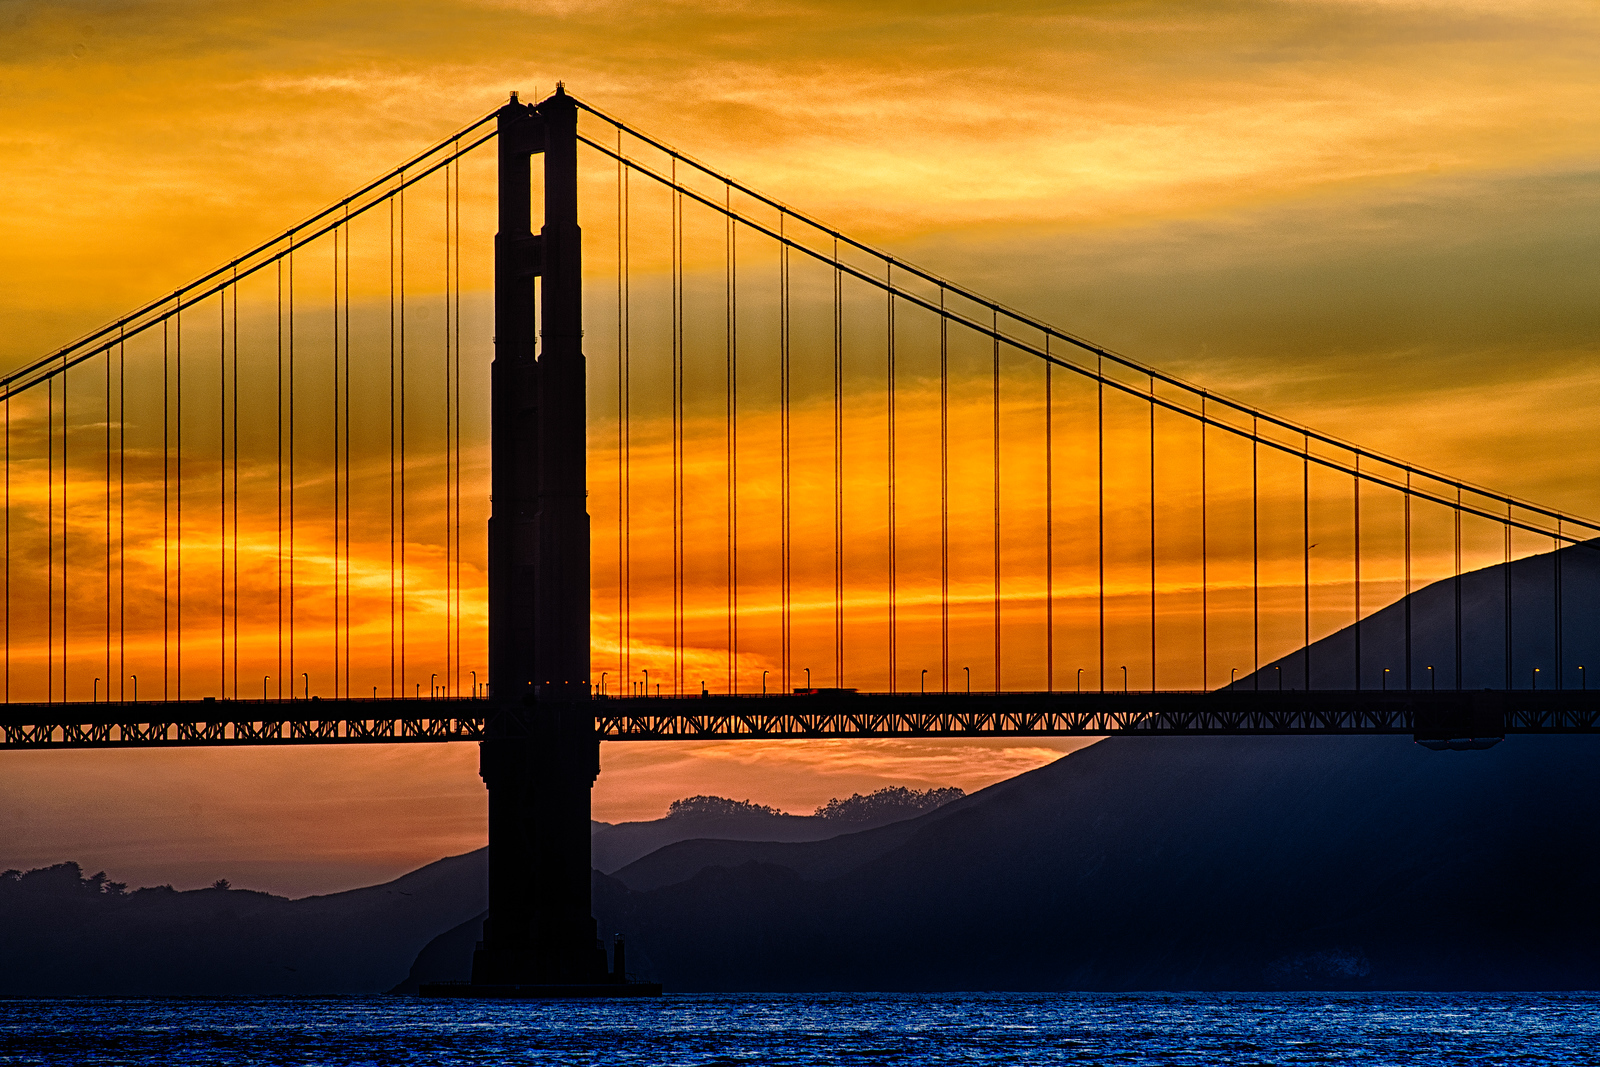 Fire Consumes Bridge